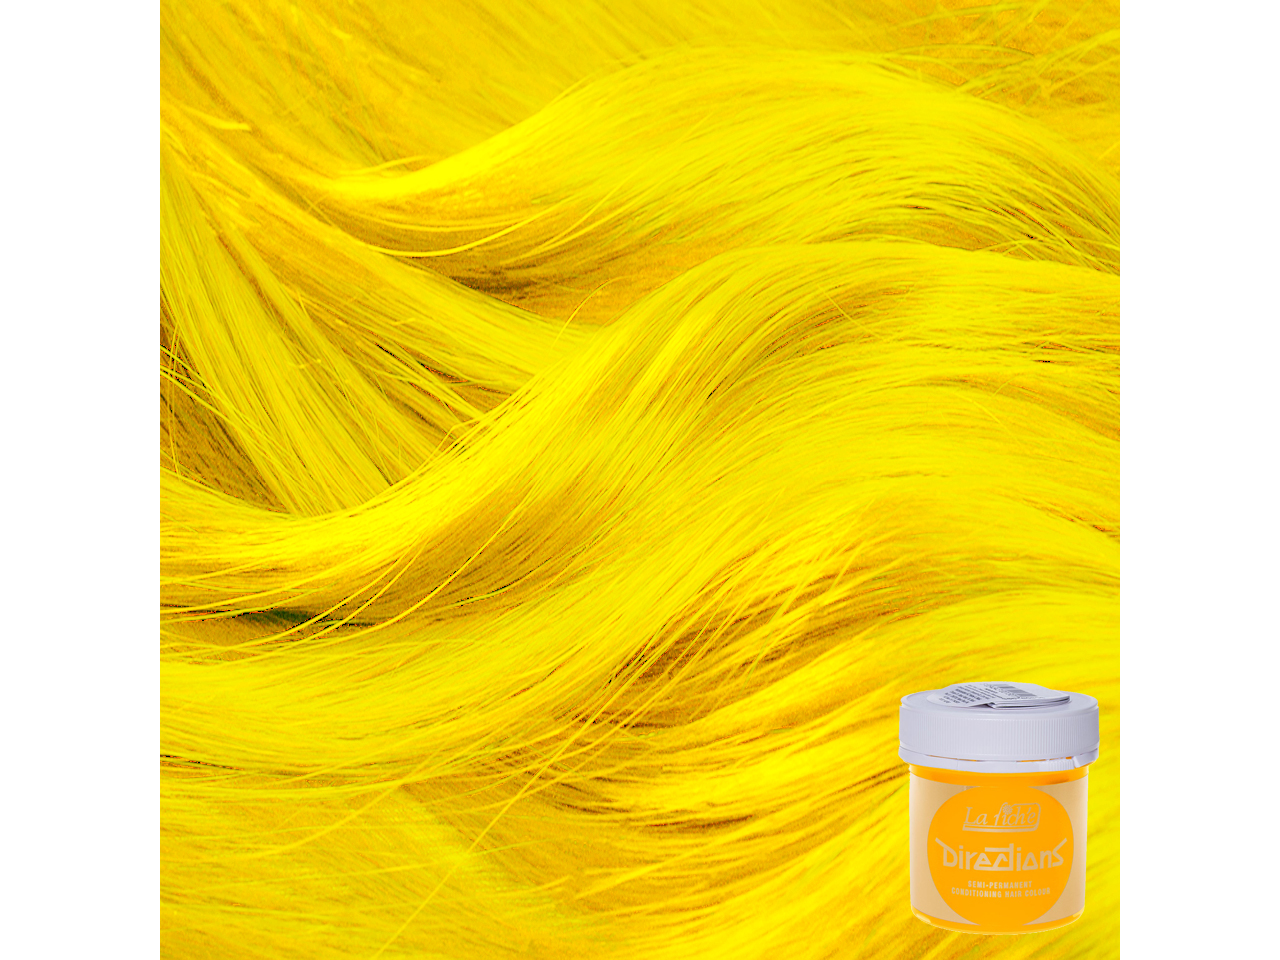 La Riche Directions Bright Daffodil Hair Dye